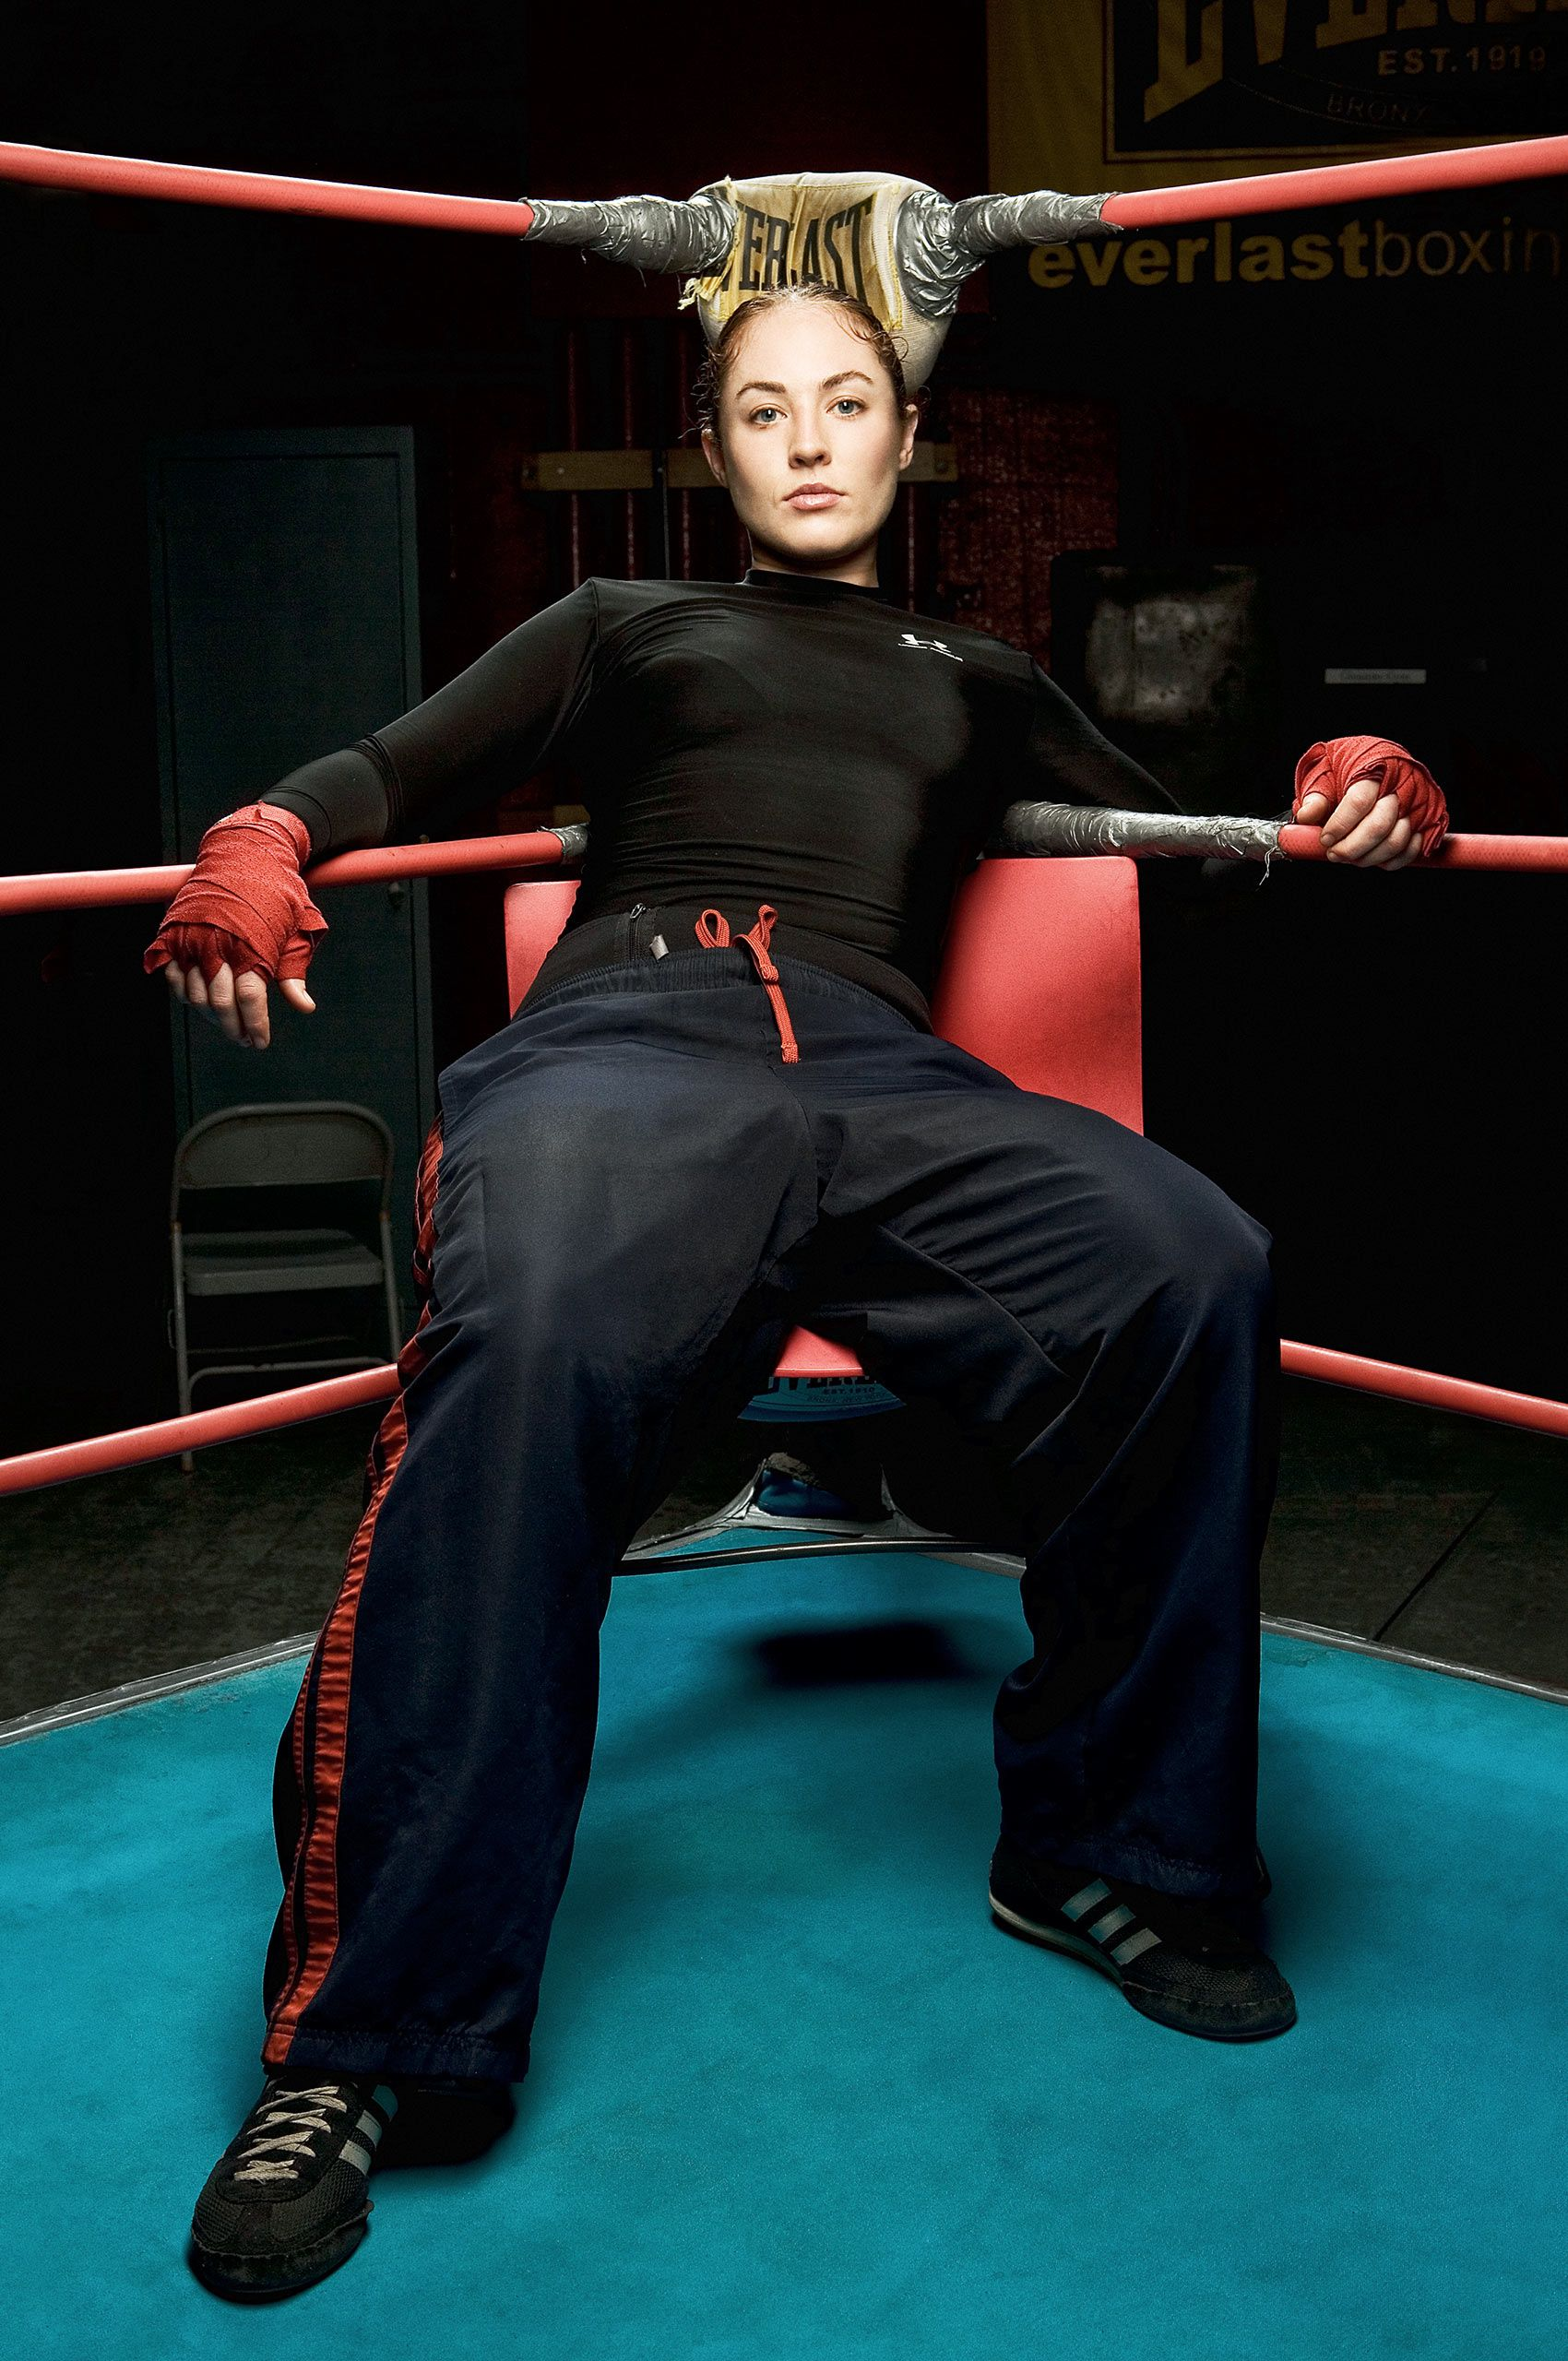 Female-boxer-HenrikOlundPhotography.jpg